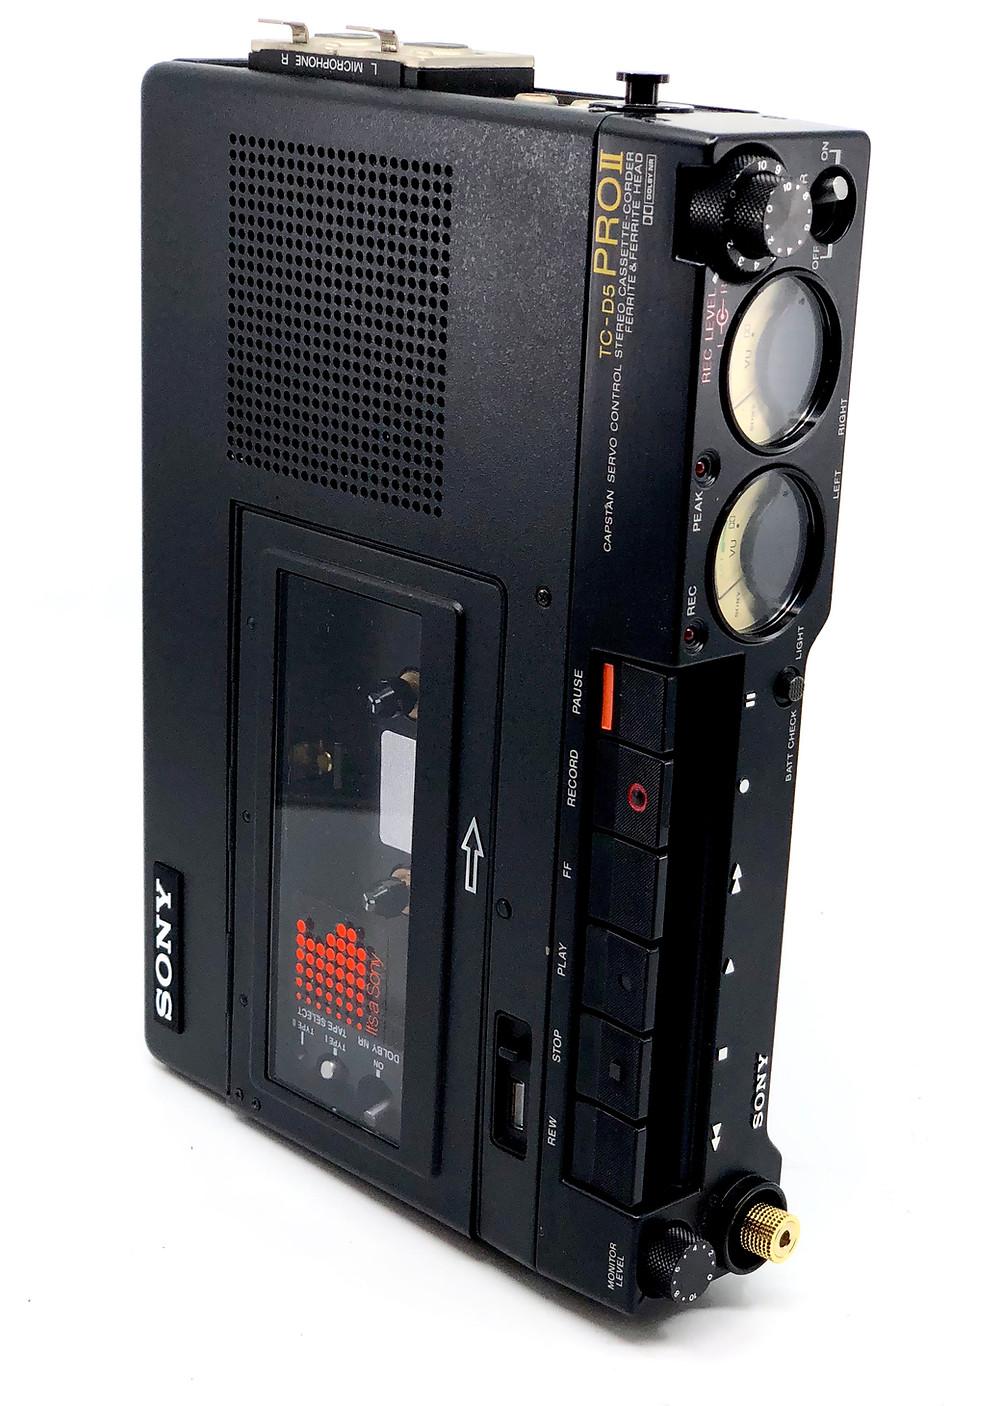 Sony TC-D5 Pro II Professional Portable Cassette Recorder